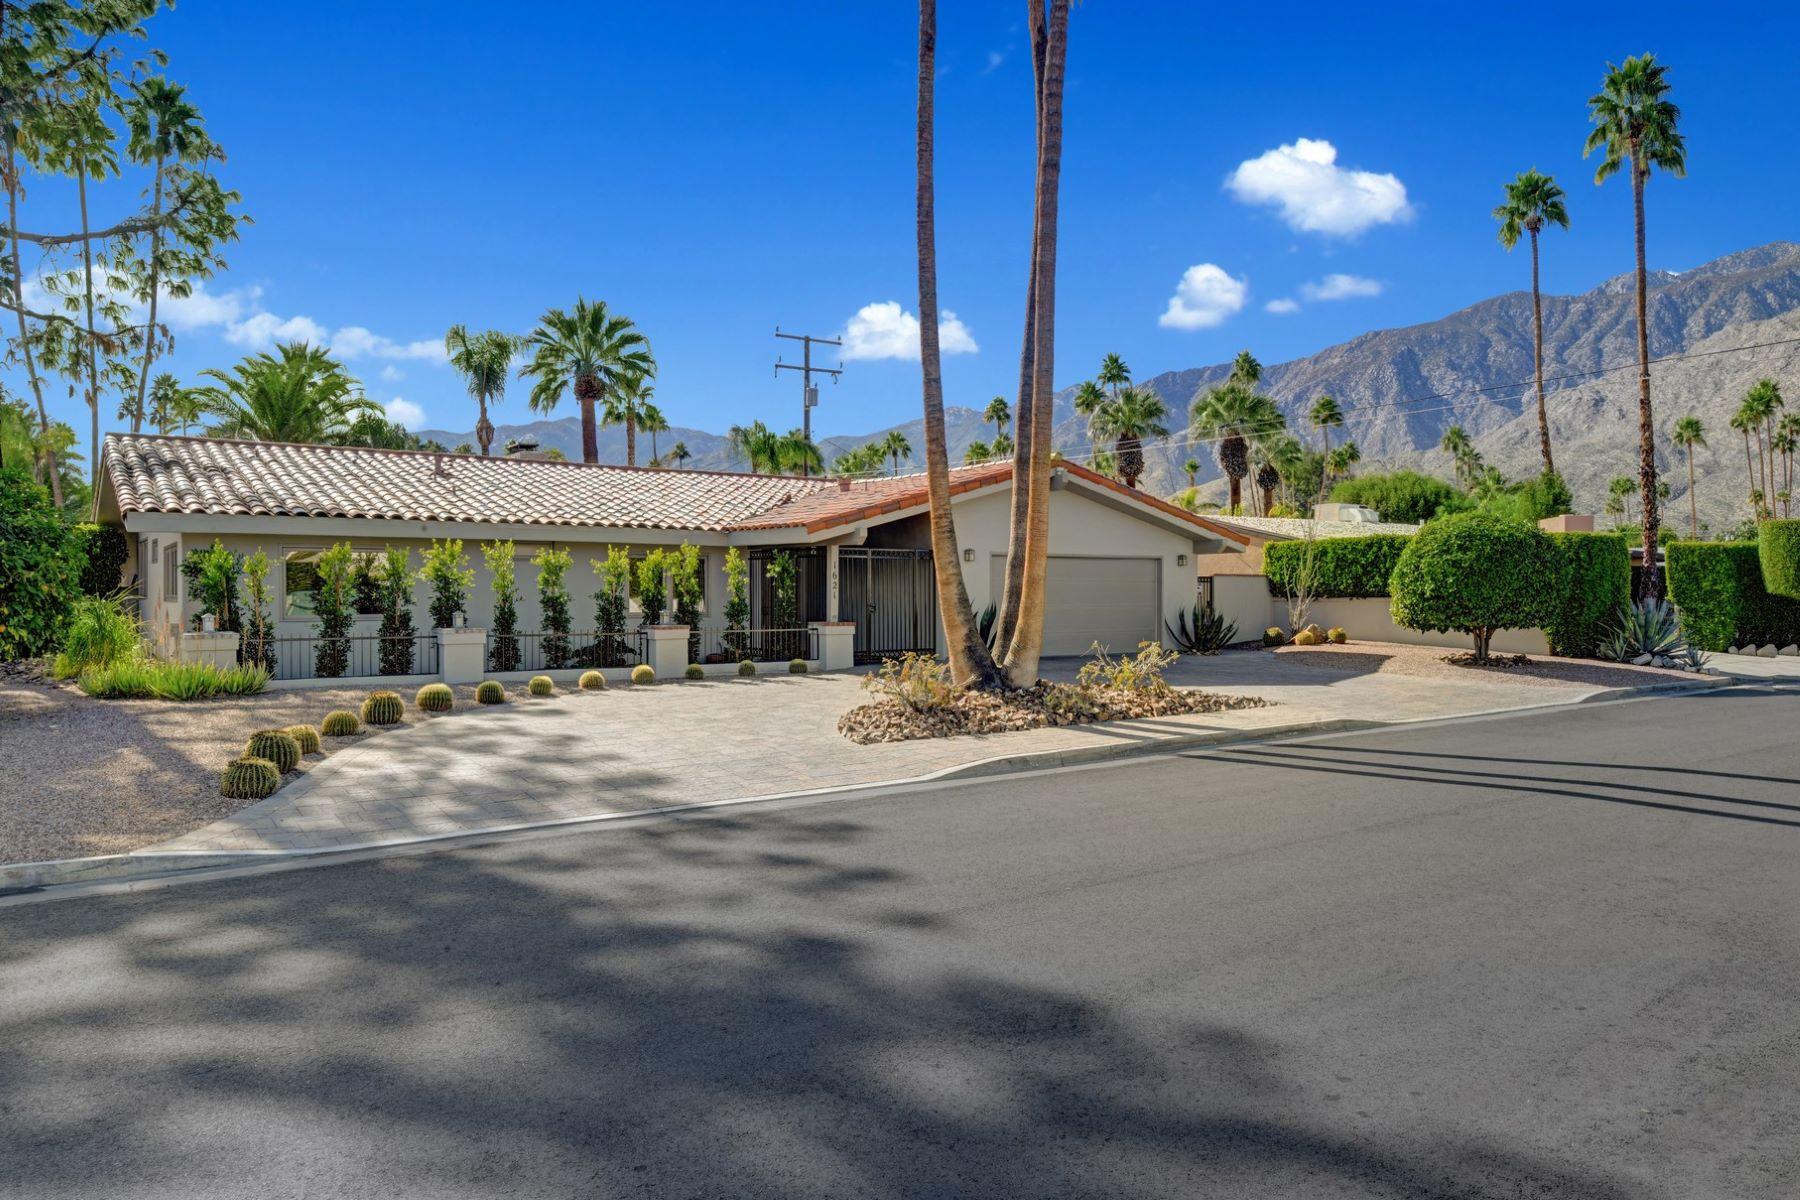 Single Family Homes para Venda às 1621 S Calle Marcus 1621 South Calle Marcus, Palm Springs, Califórnia 92264 Estados Unidos